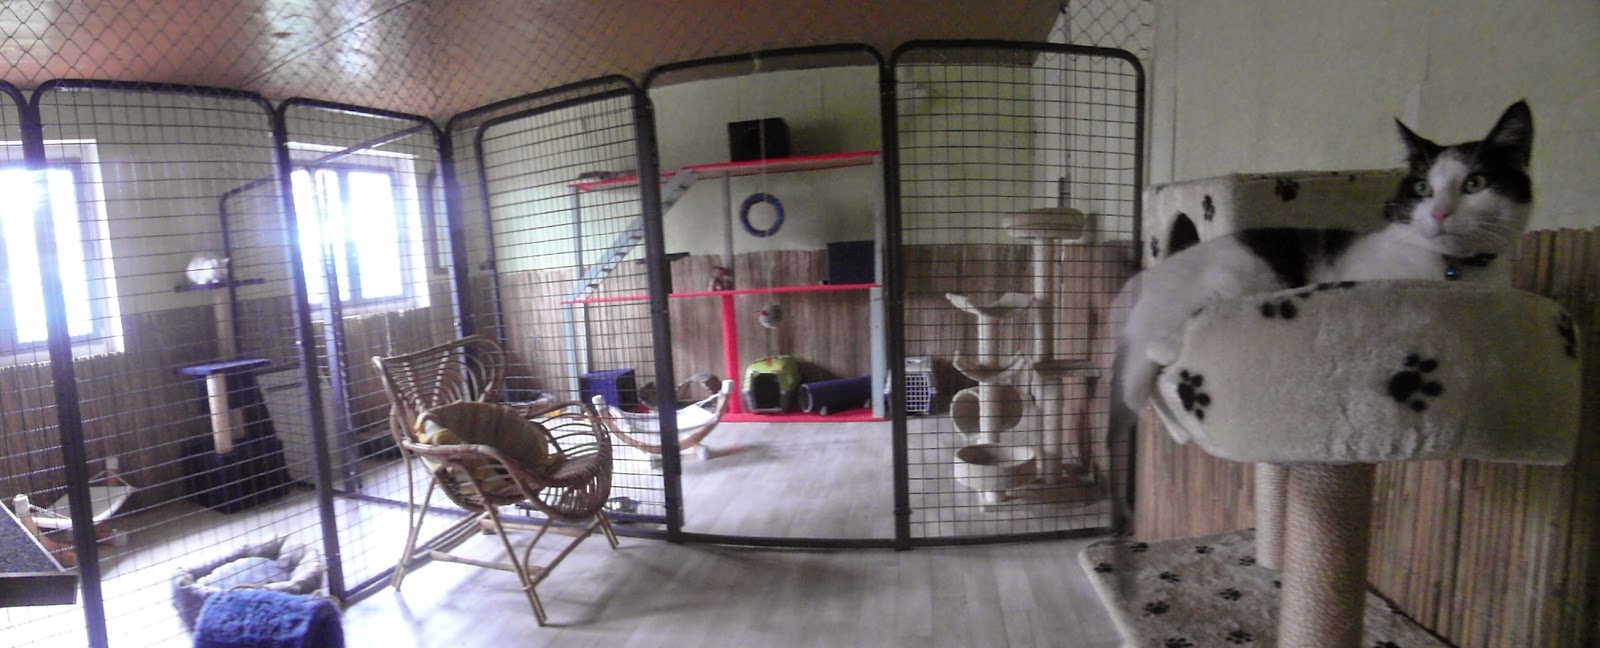 l 39 arche d 39 ely pension chat. Black Bedroom Furniture Sets. Home Design Ideas